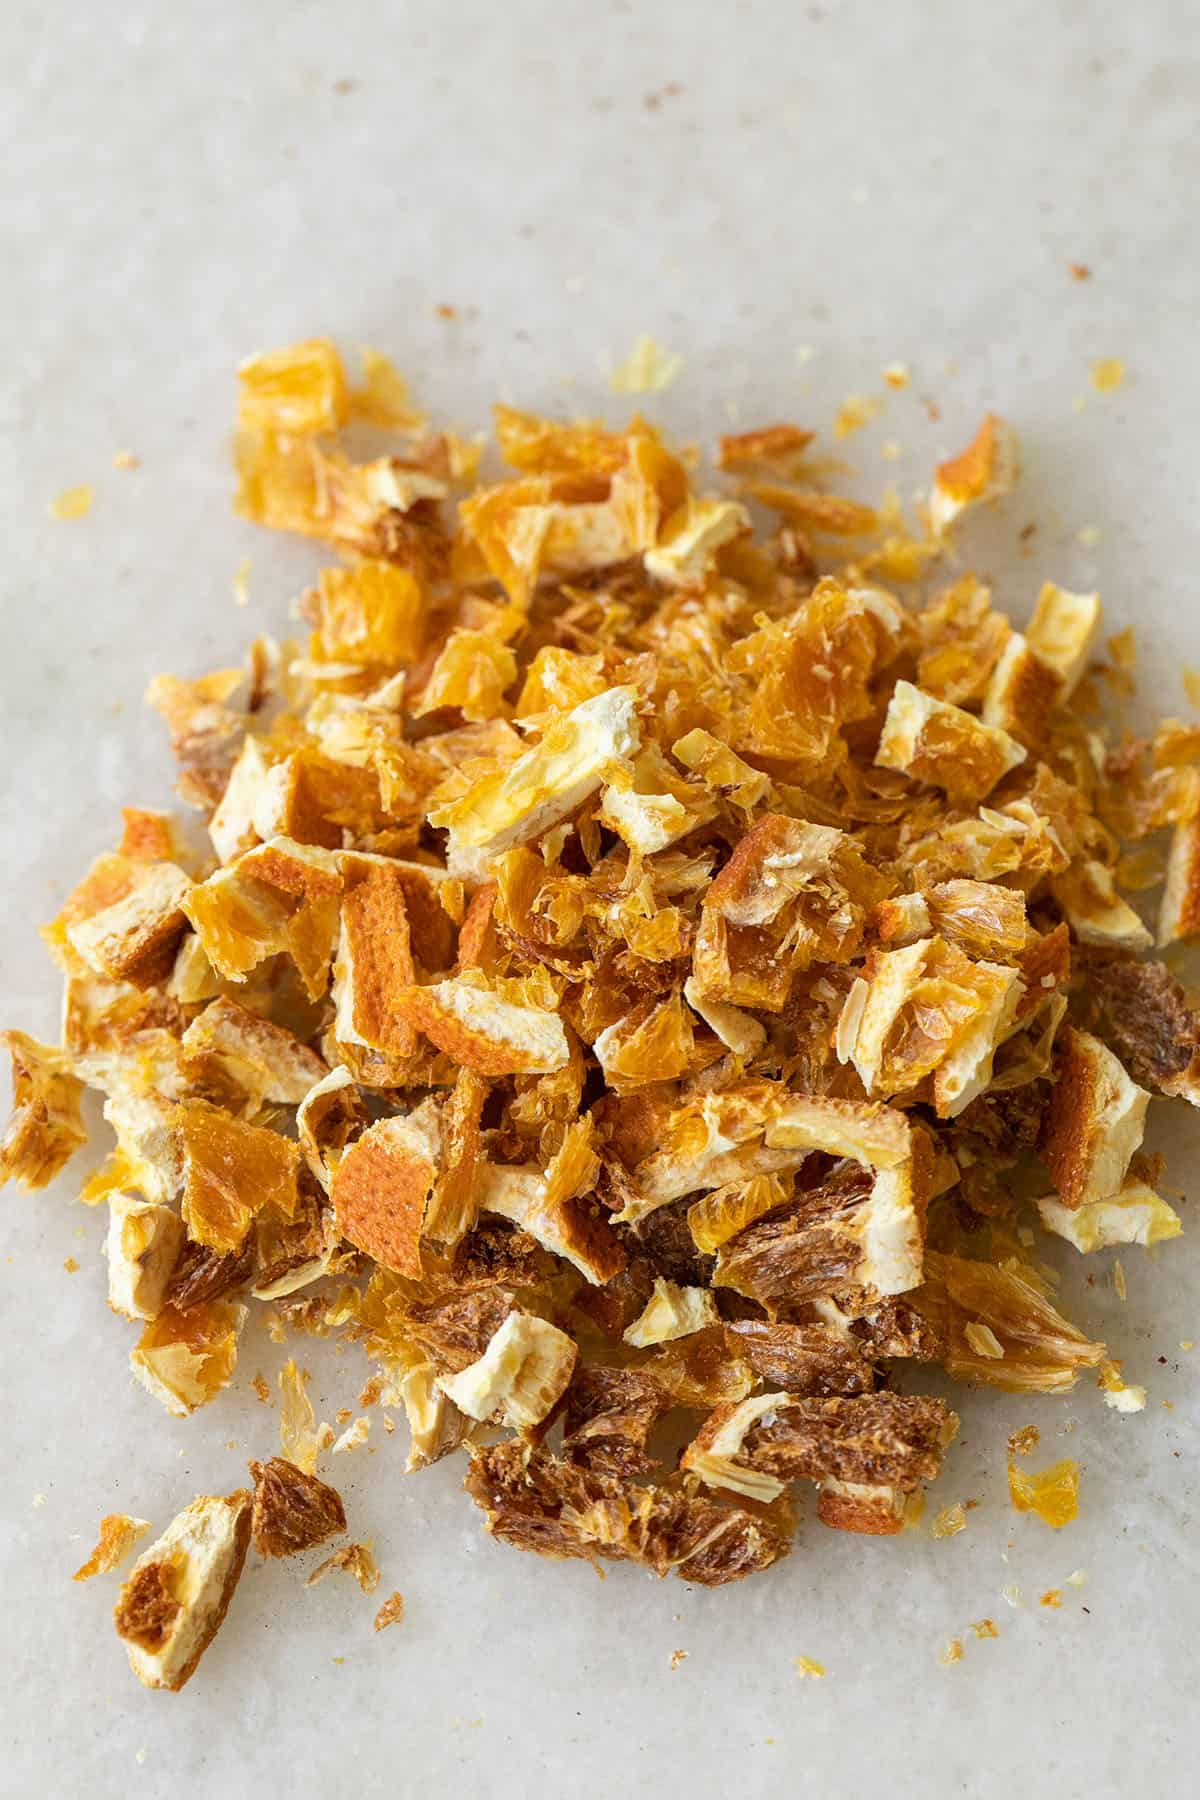 sliced orange peel for mulling spices